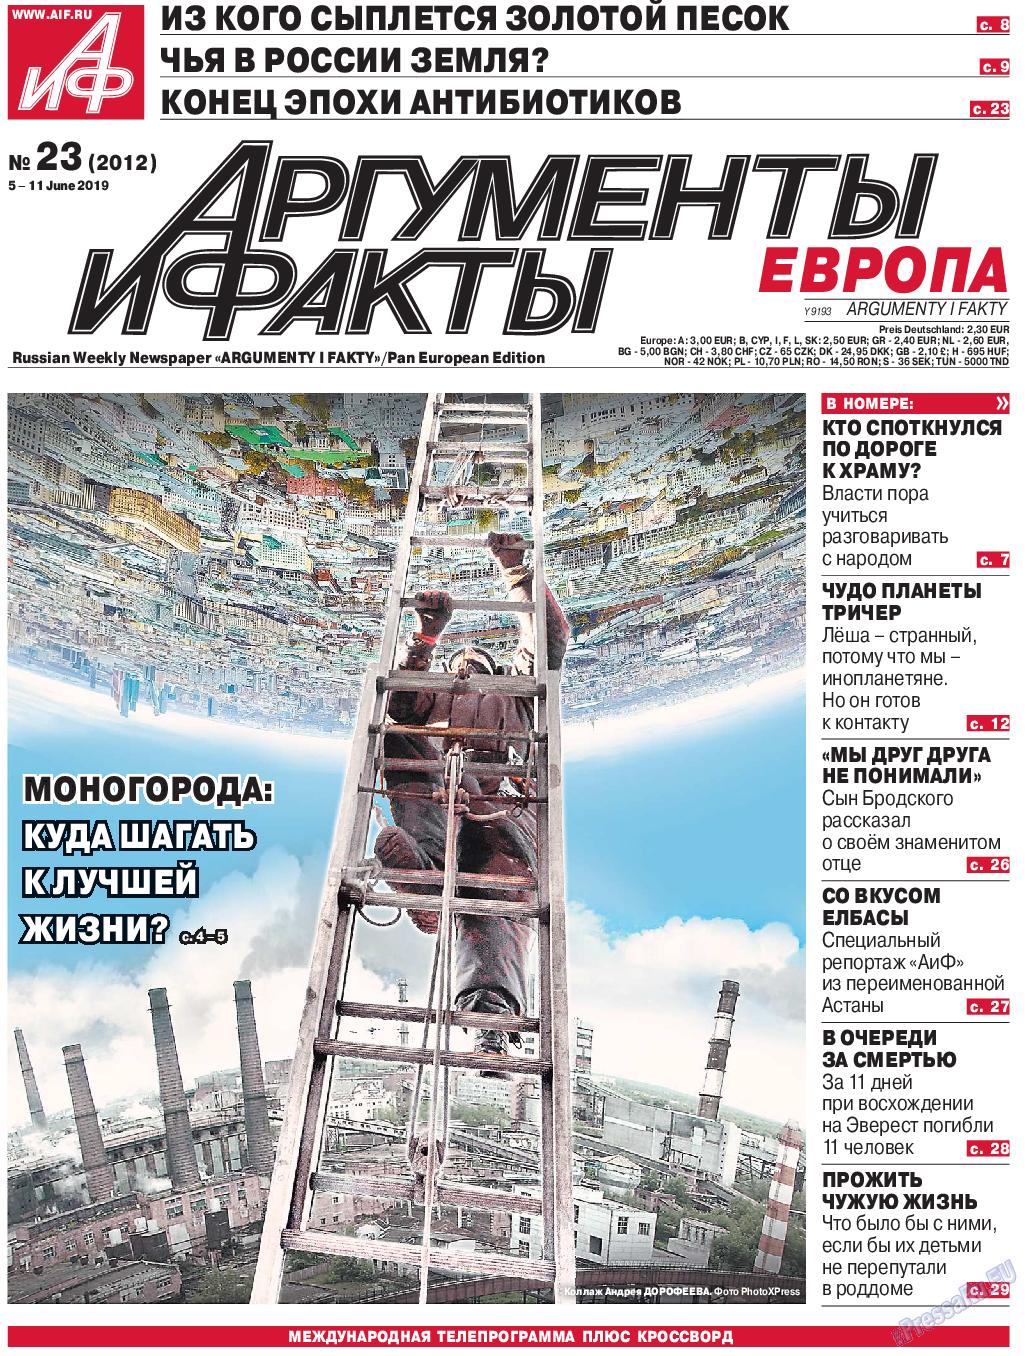 Аргументы и факты Европа (газета). 2019 год, номер 23, стр. 1